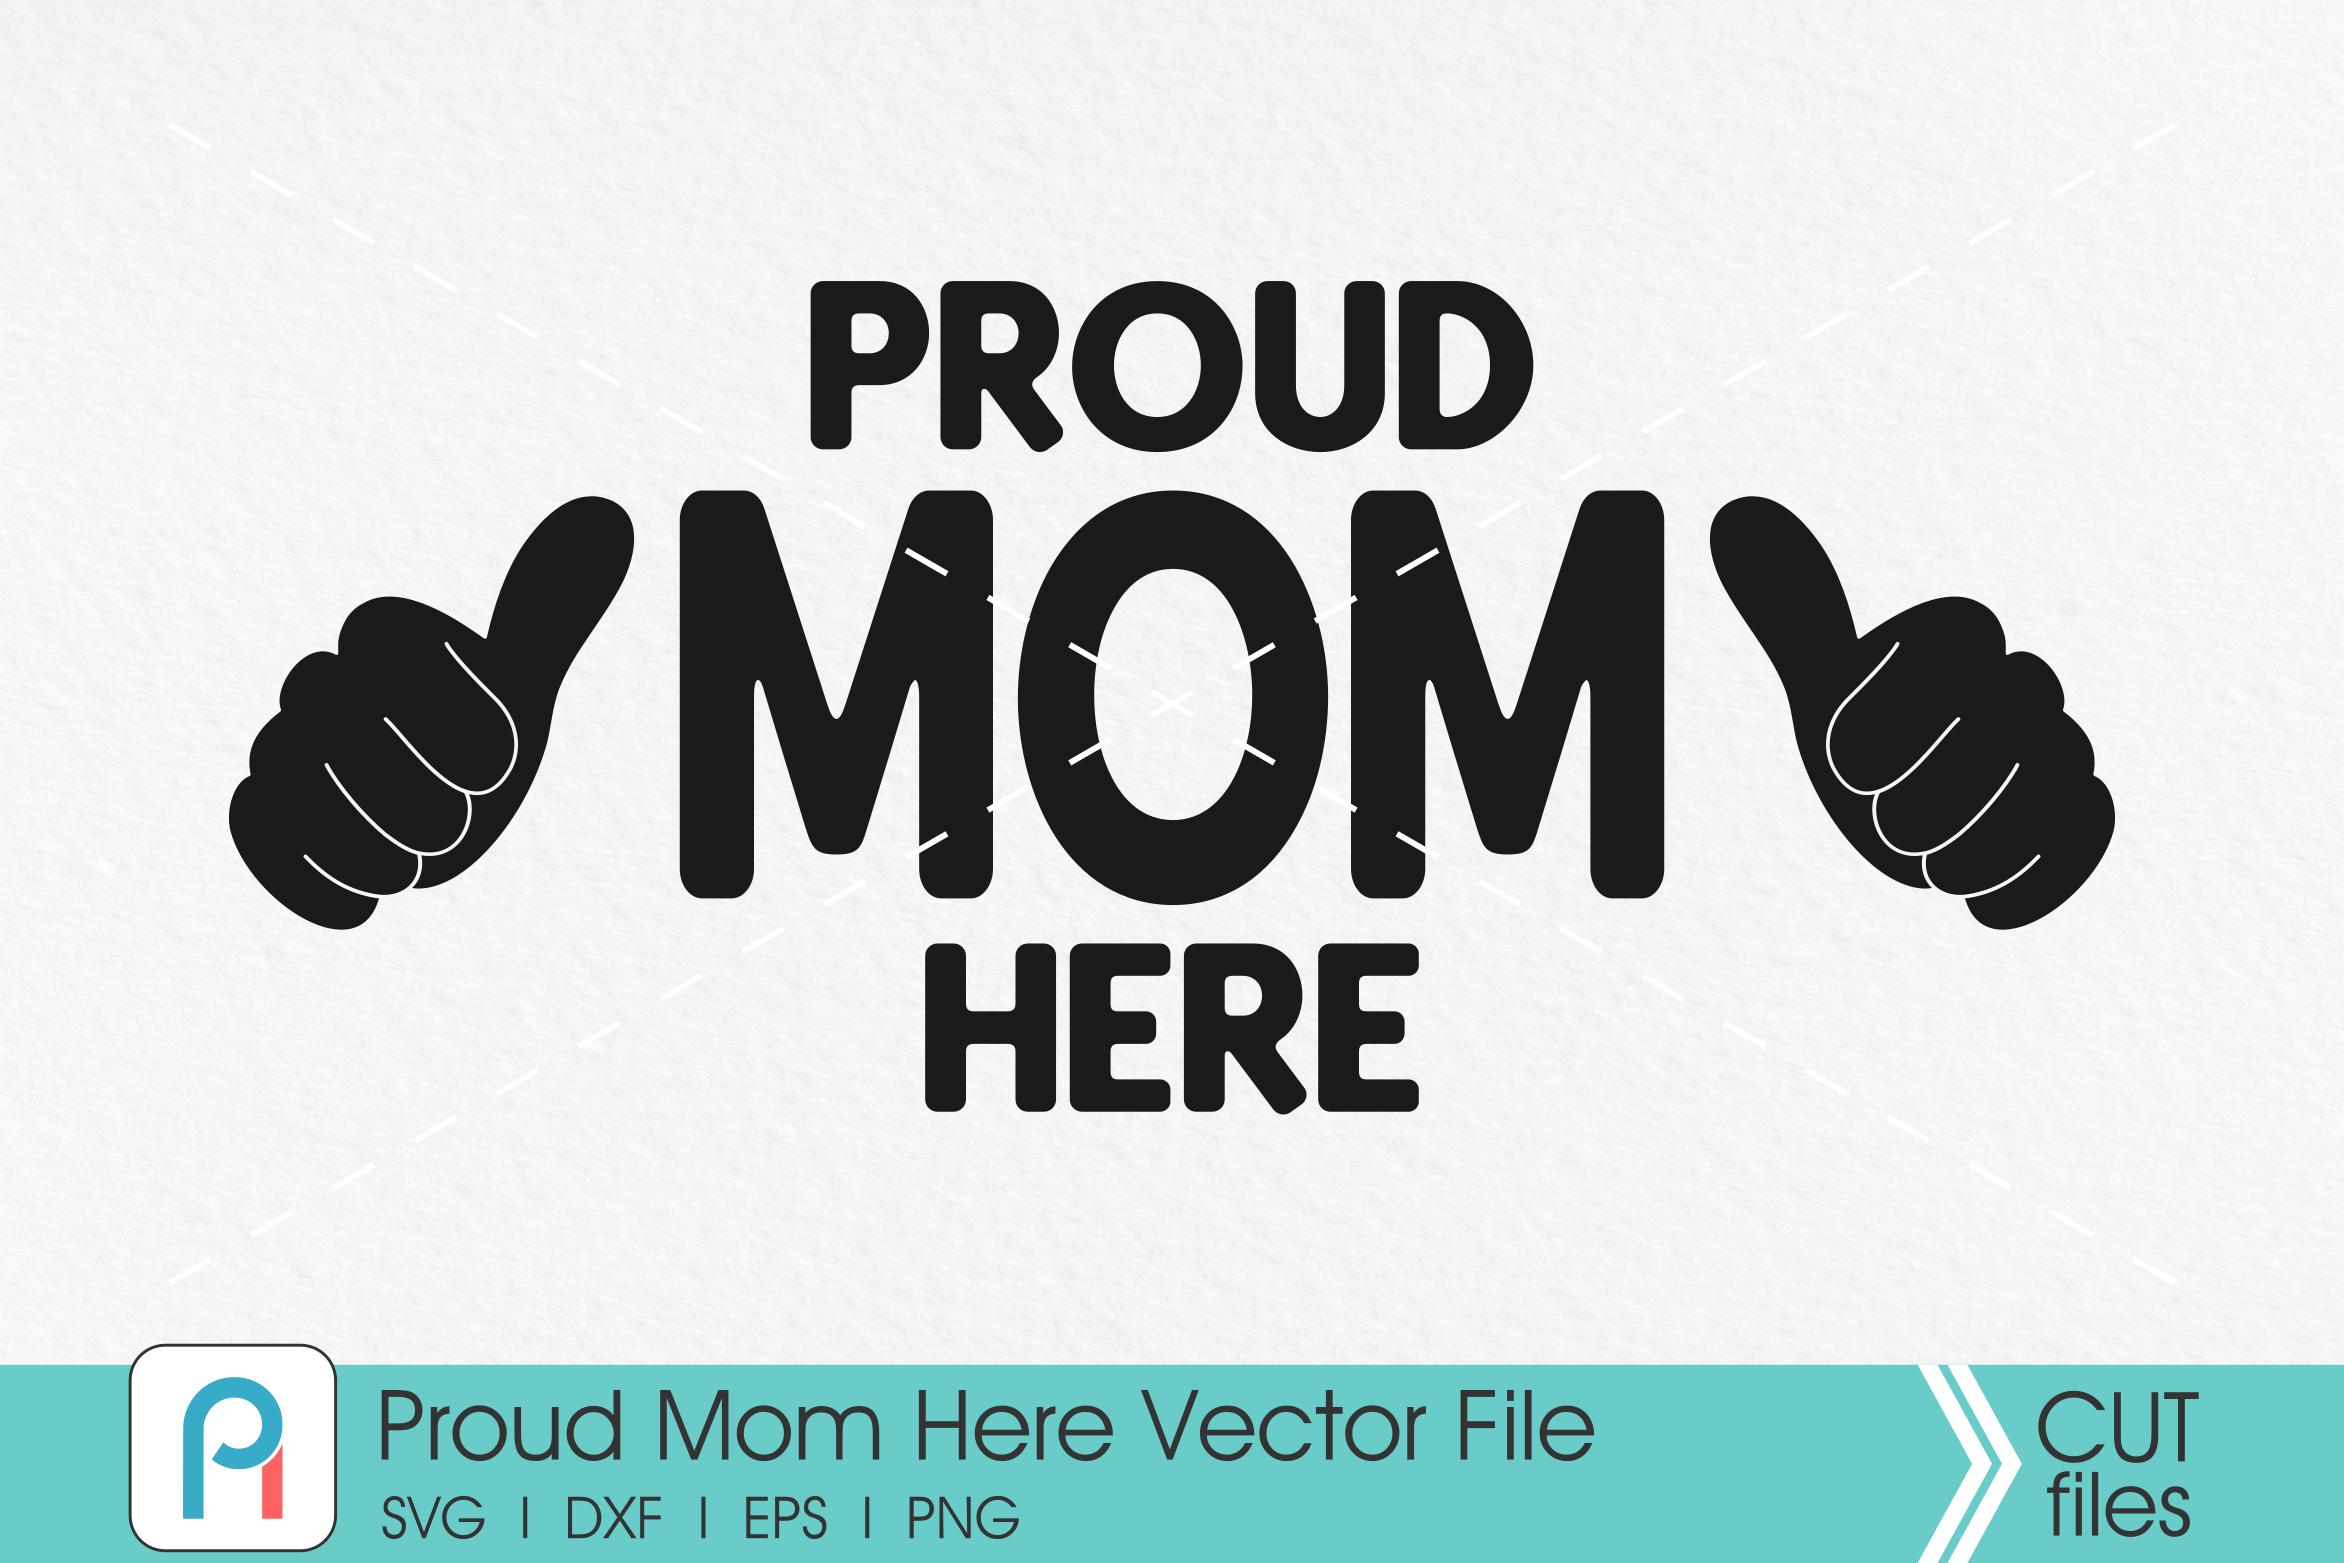 Proud Mom Svg, Mom Svg, Proud Mom Here Svg, Mom Clip Art example image 1